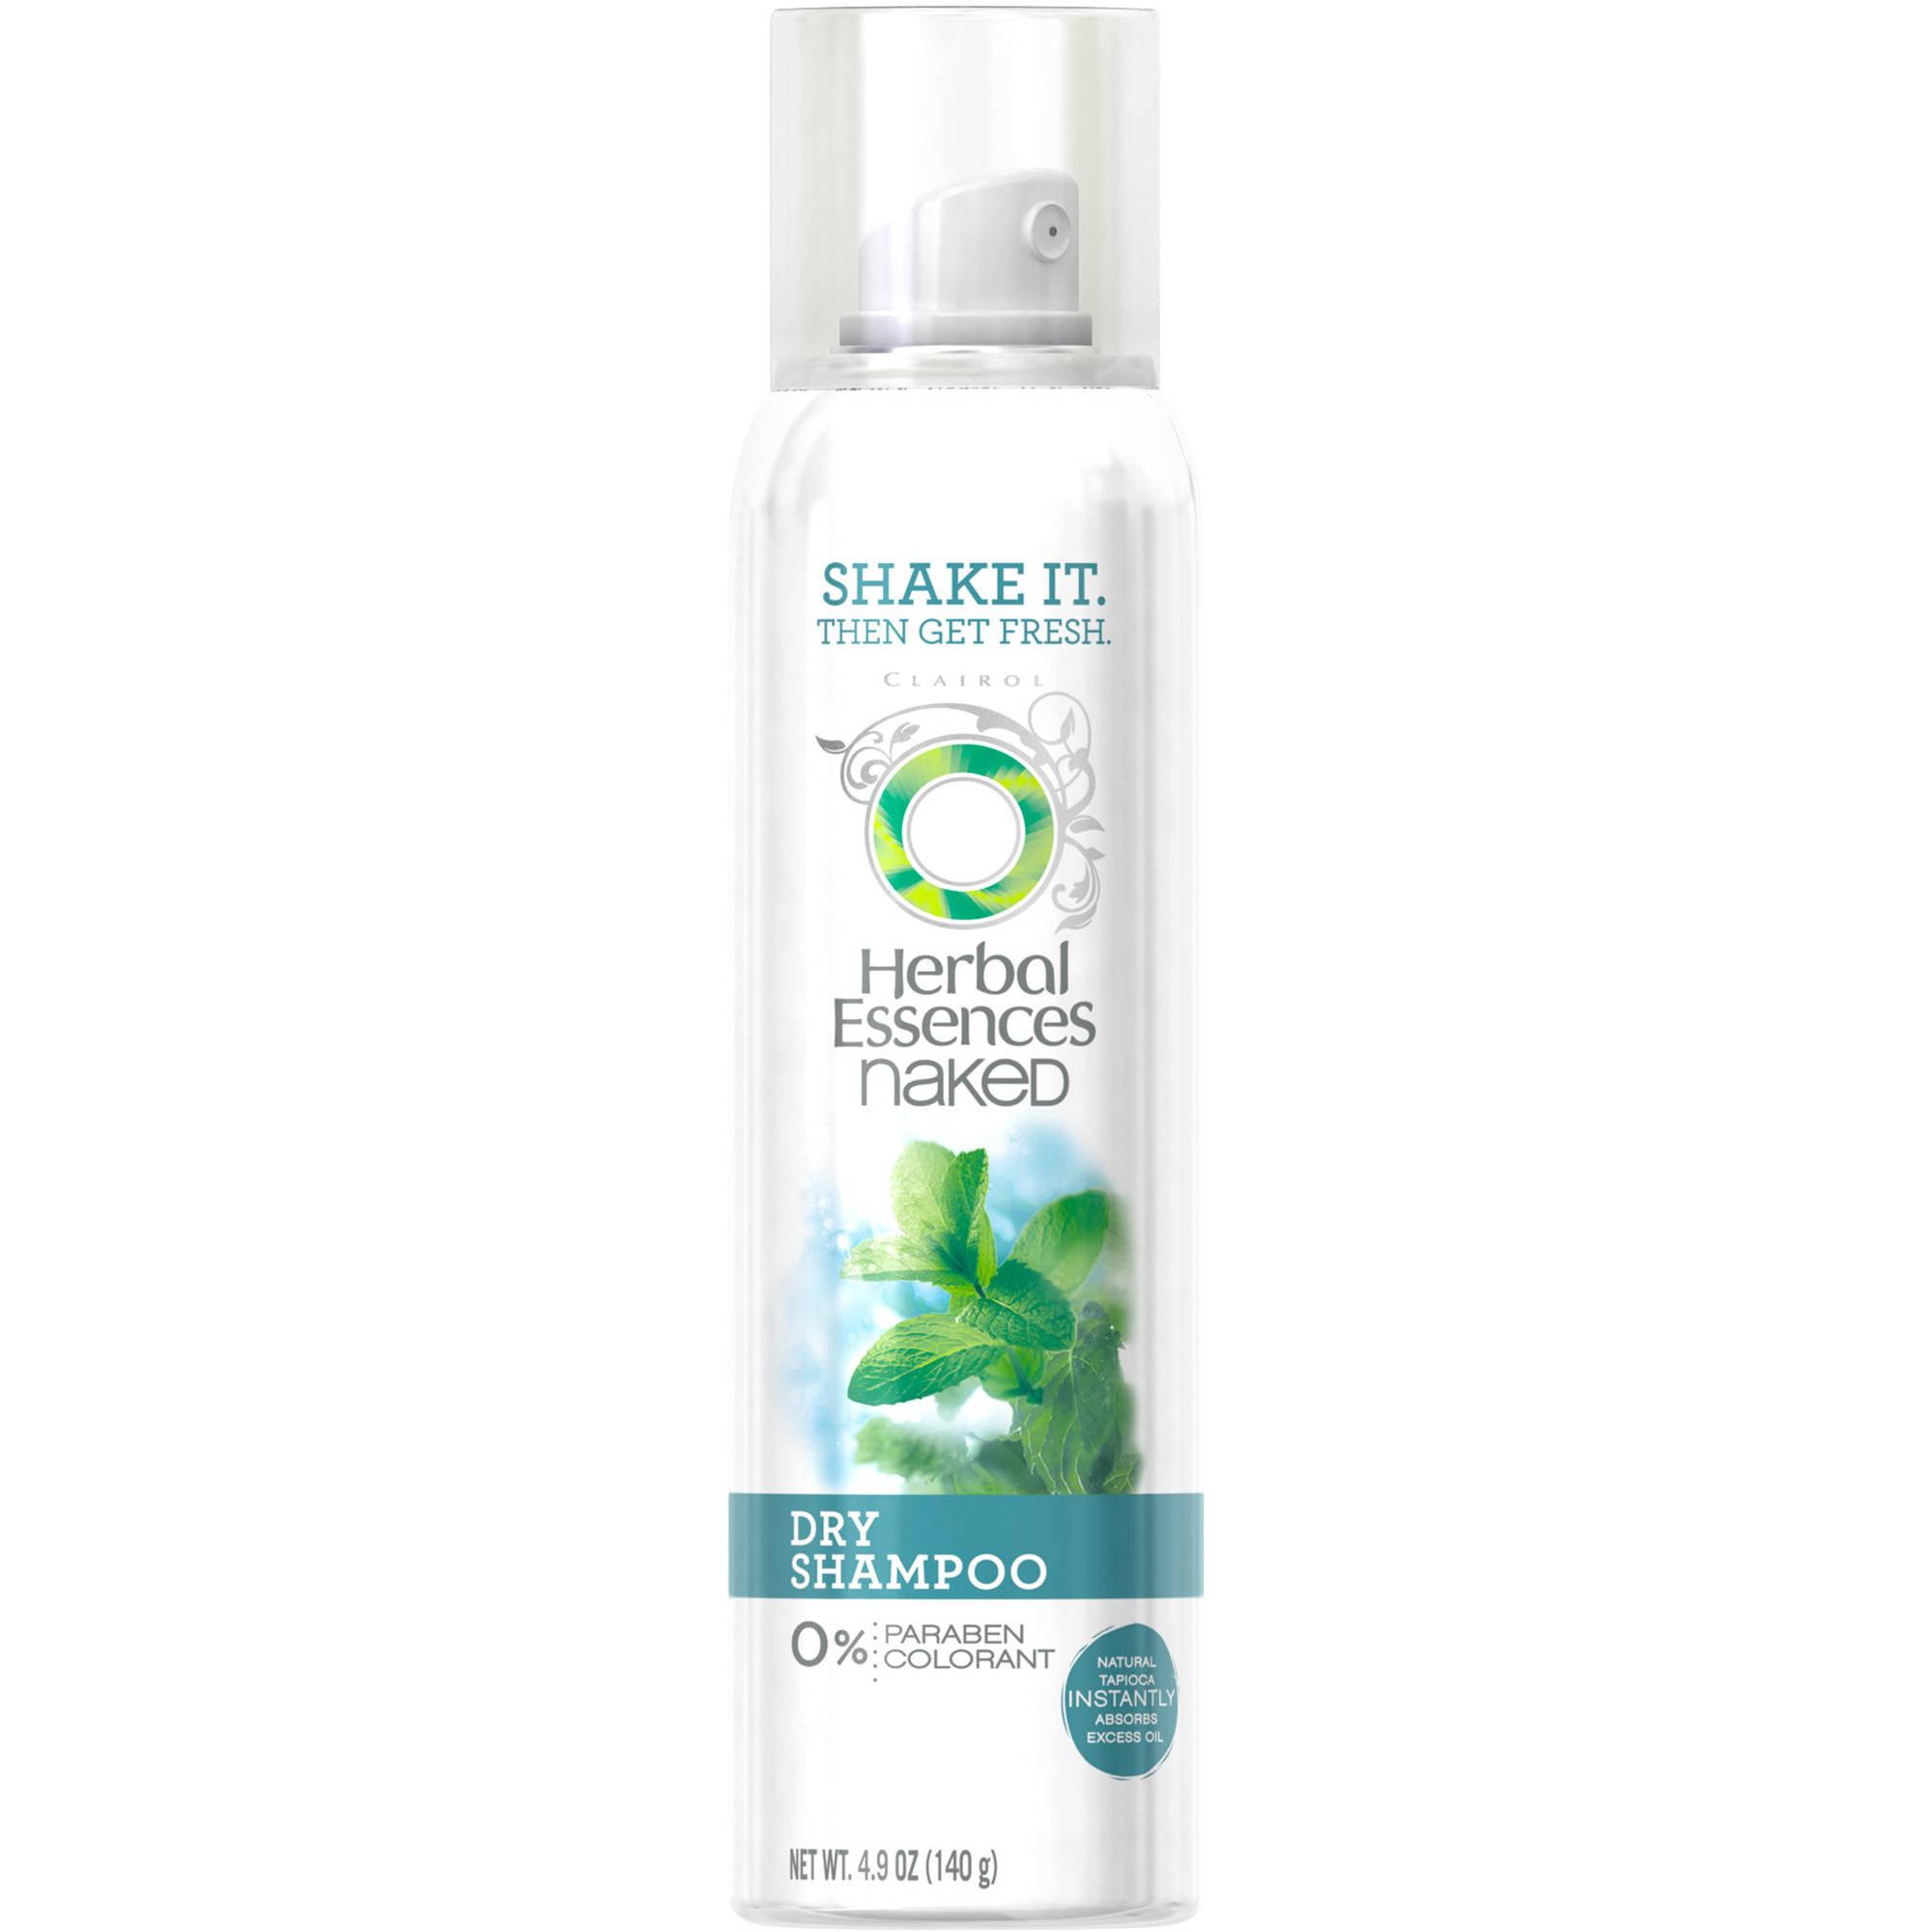 Herbal essences naked dry shampoo pics 37